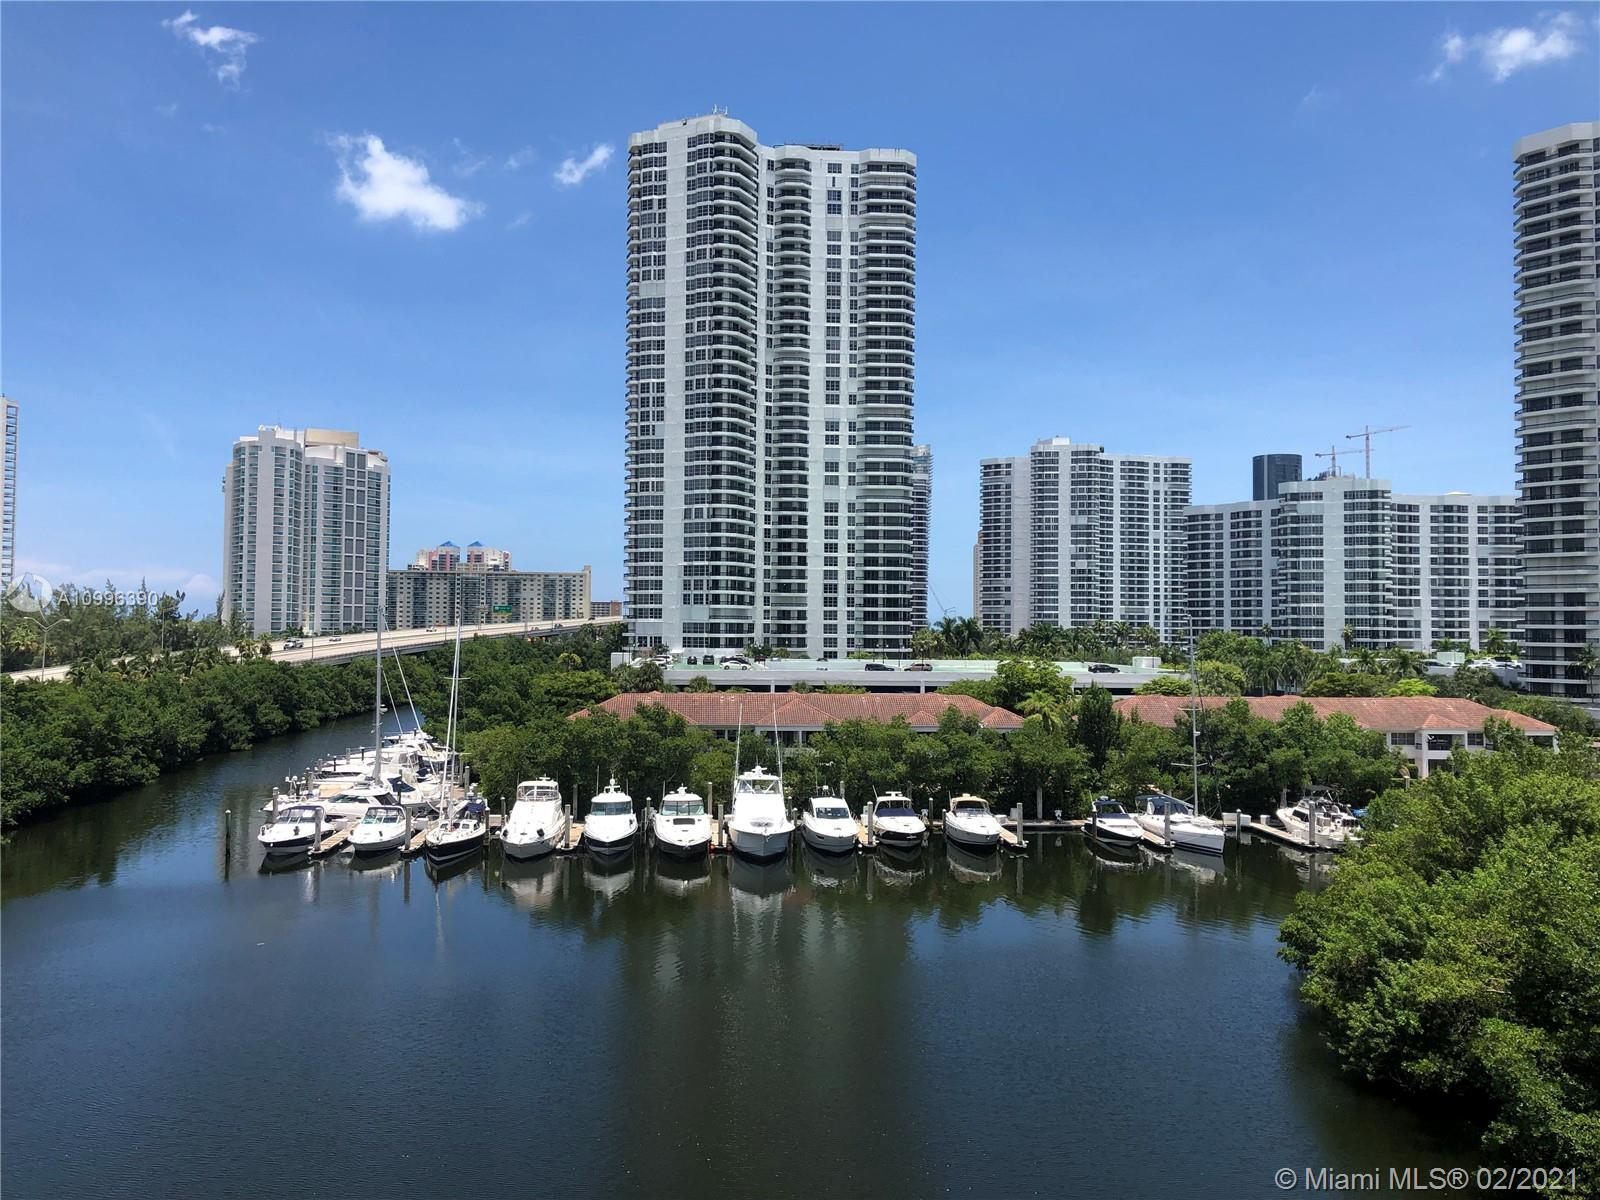 Mystic Pointe Tower 600 #609 - 3400 NE 192 ST #609, Aventura, FL 33180